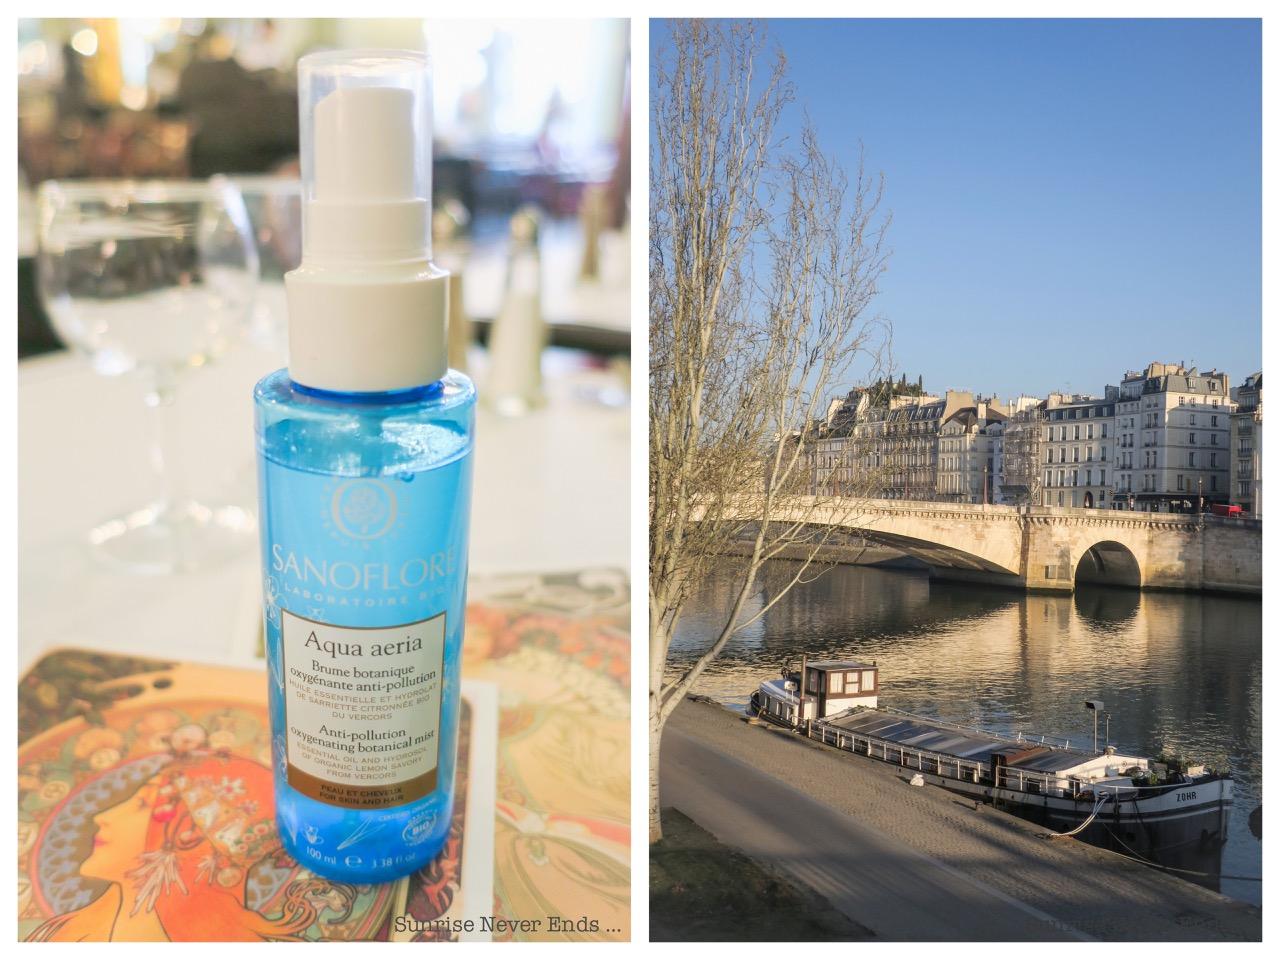 paris,lolita,jean paul gaultier,montre,sanoflore,hydro flask,aqua aeria